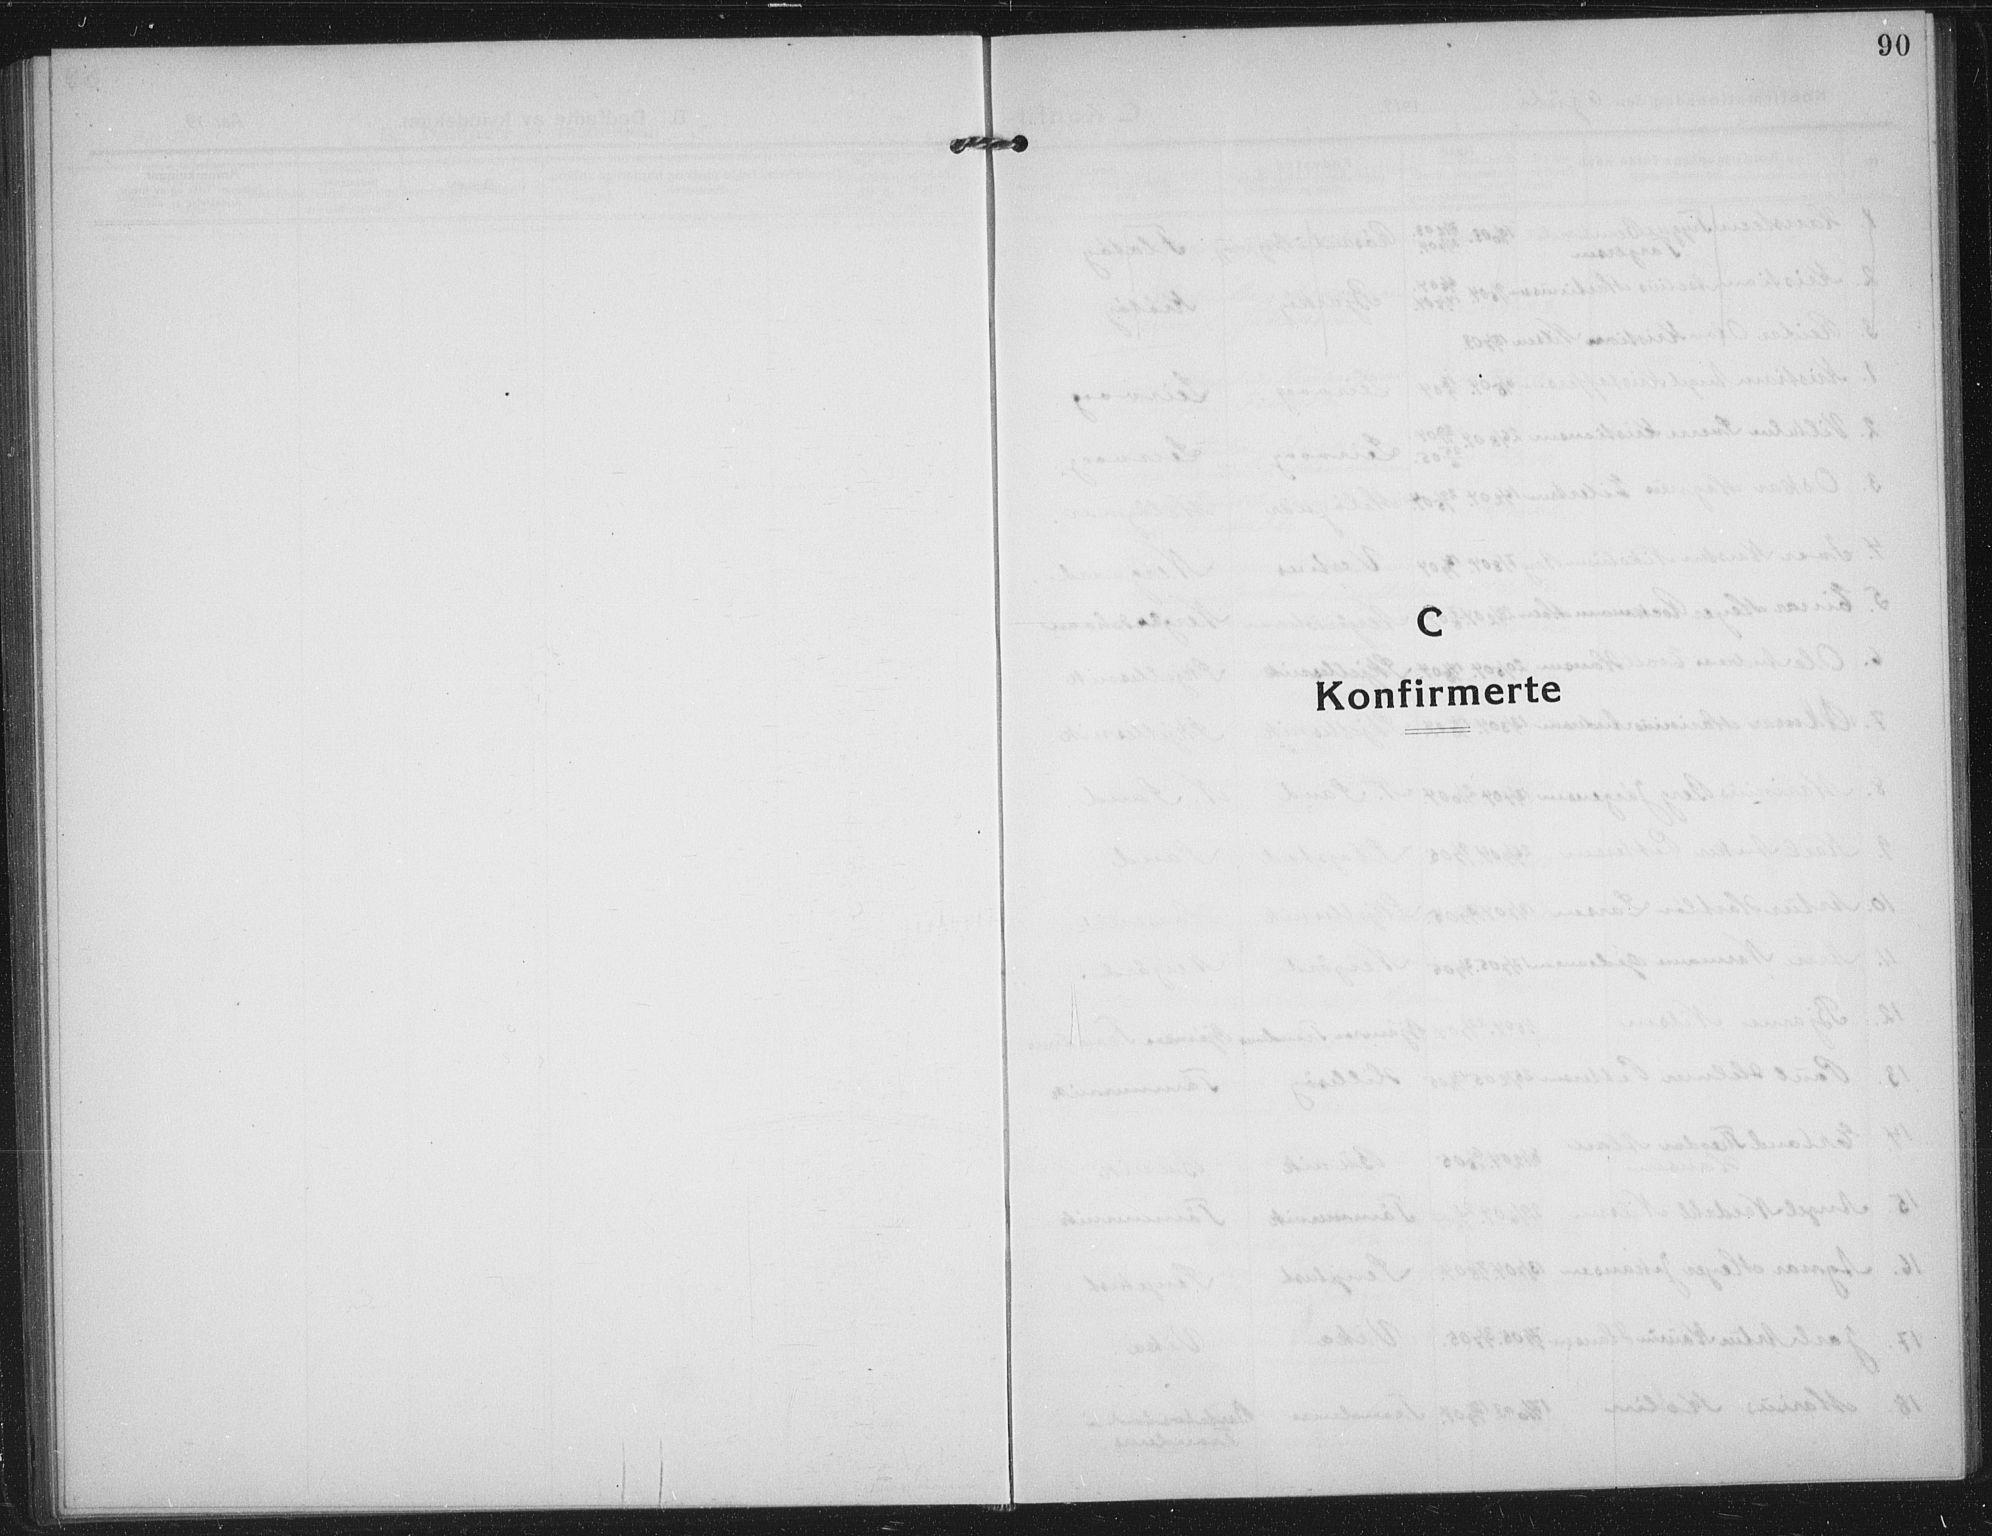 SATØ, Sand/Bjarkøy sokneprestkontor, I/Ia/Iab/L0005klokker: Klokkerbok nr. 5, 1919-1937, s. 90